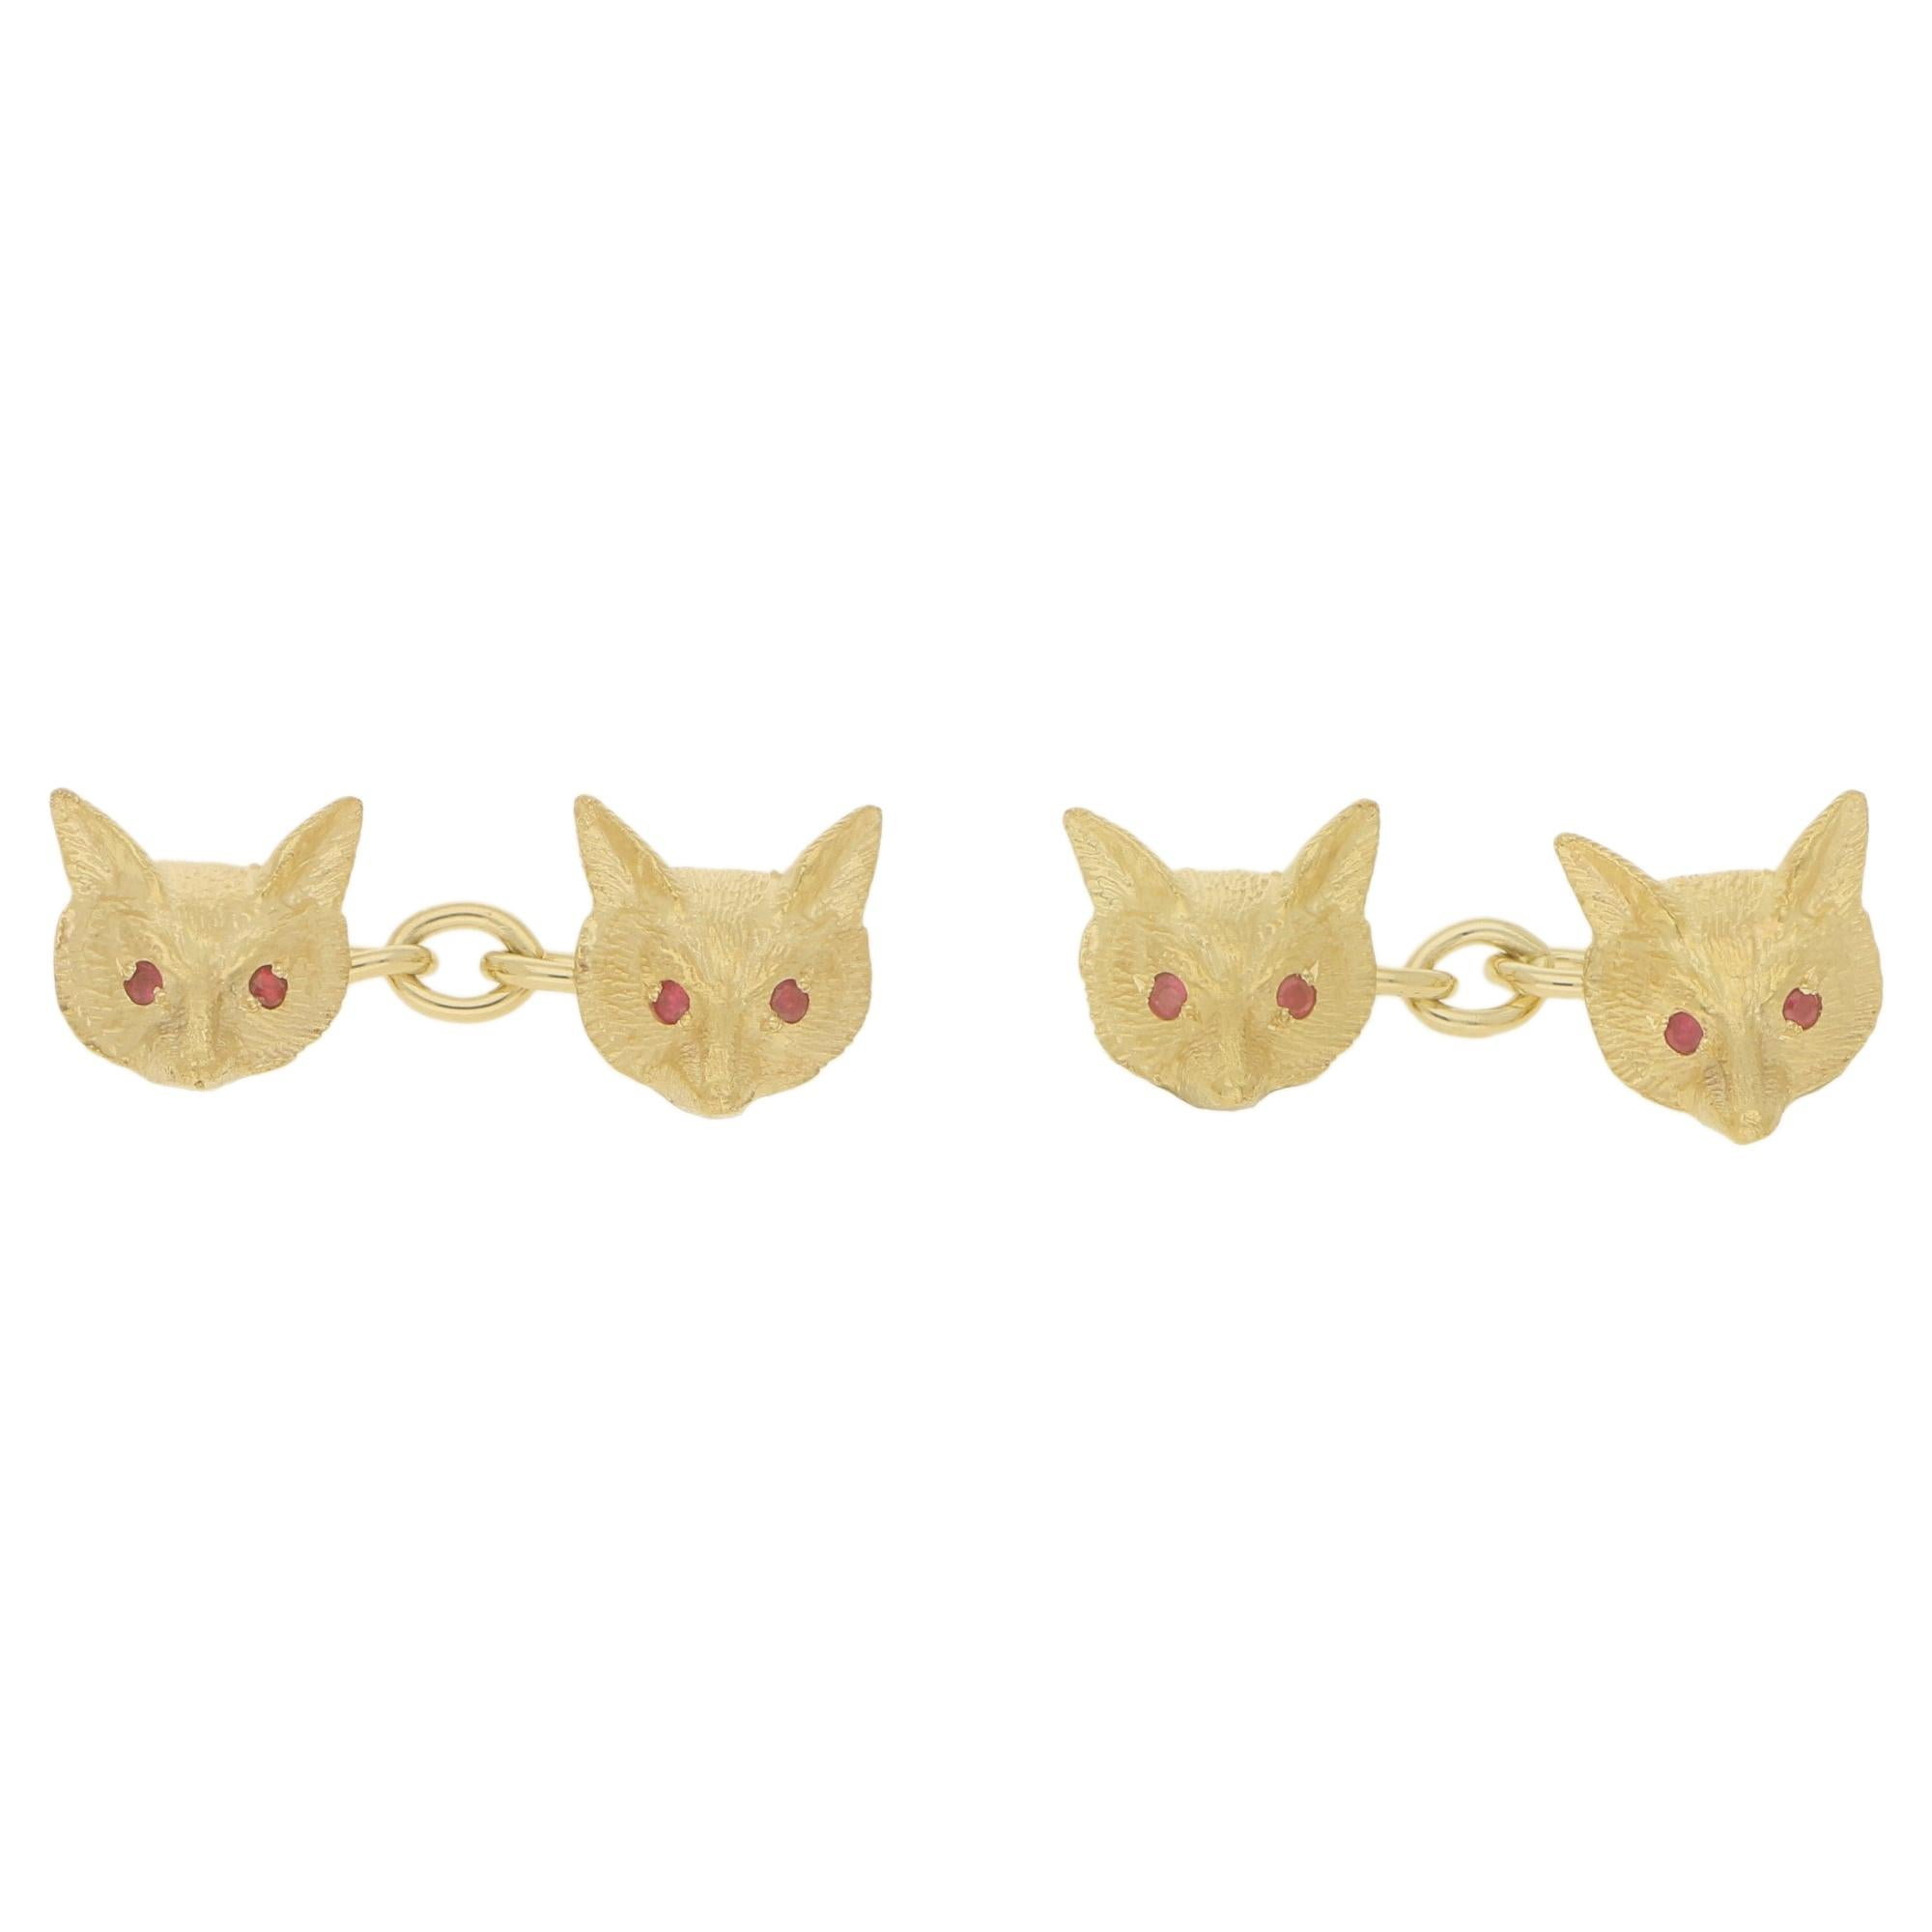 Ruby Eyed Fox Head Chain Cufflinks Set in 9 Karat Yellow Gold